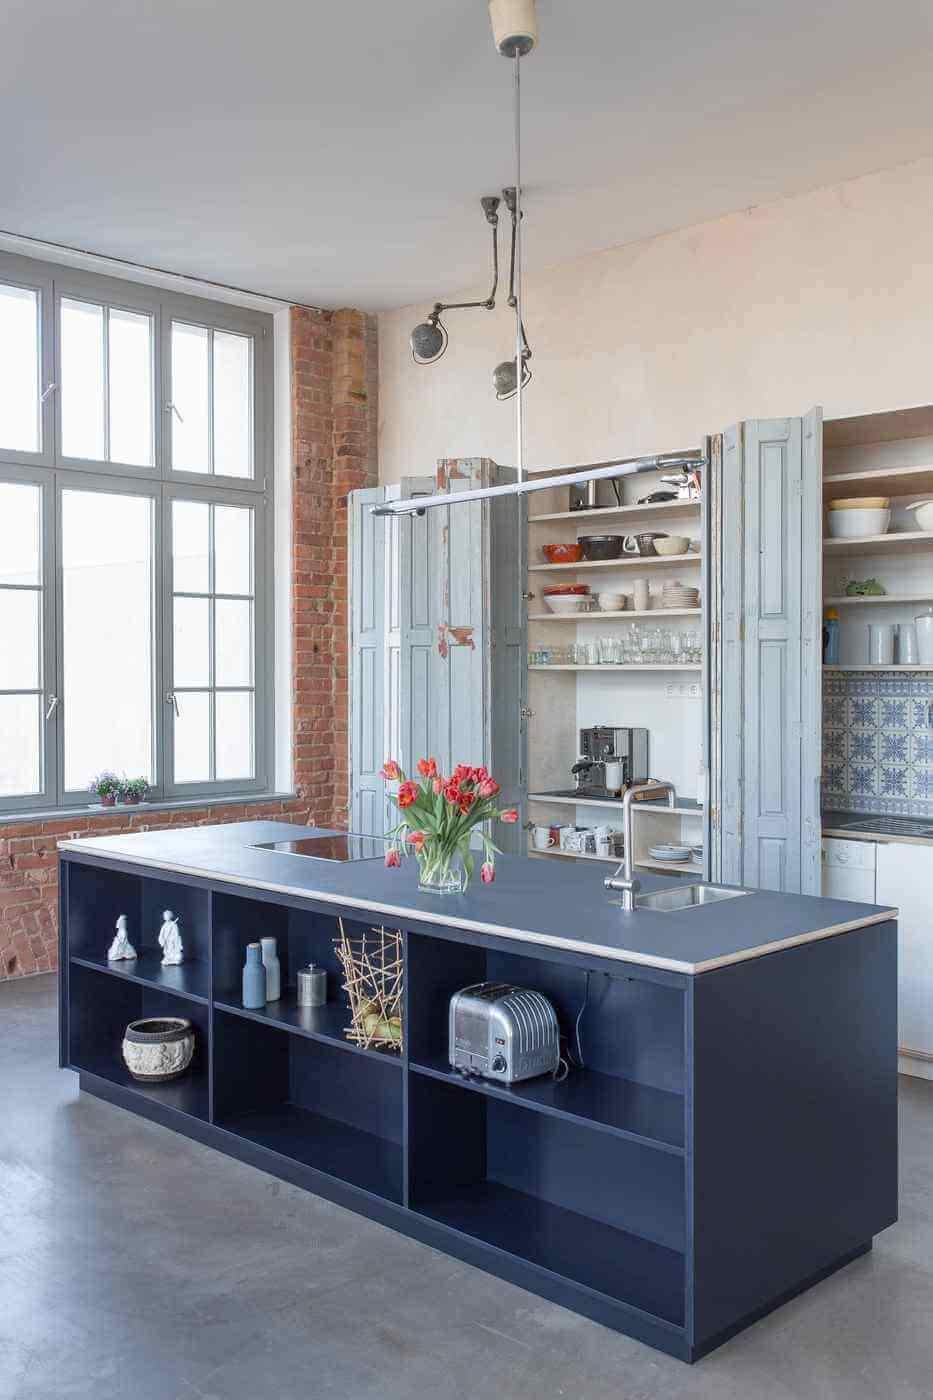 tischlermeister richard wintermann. Black Bedroom Furniture Sets. Home Design Ideas